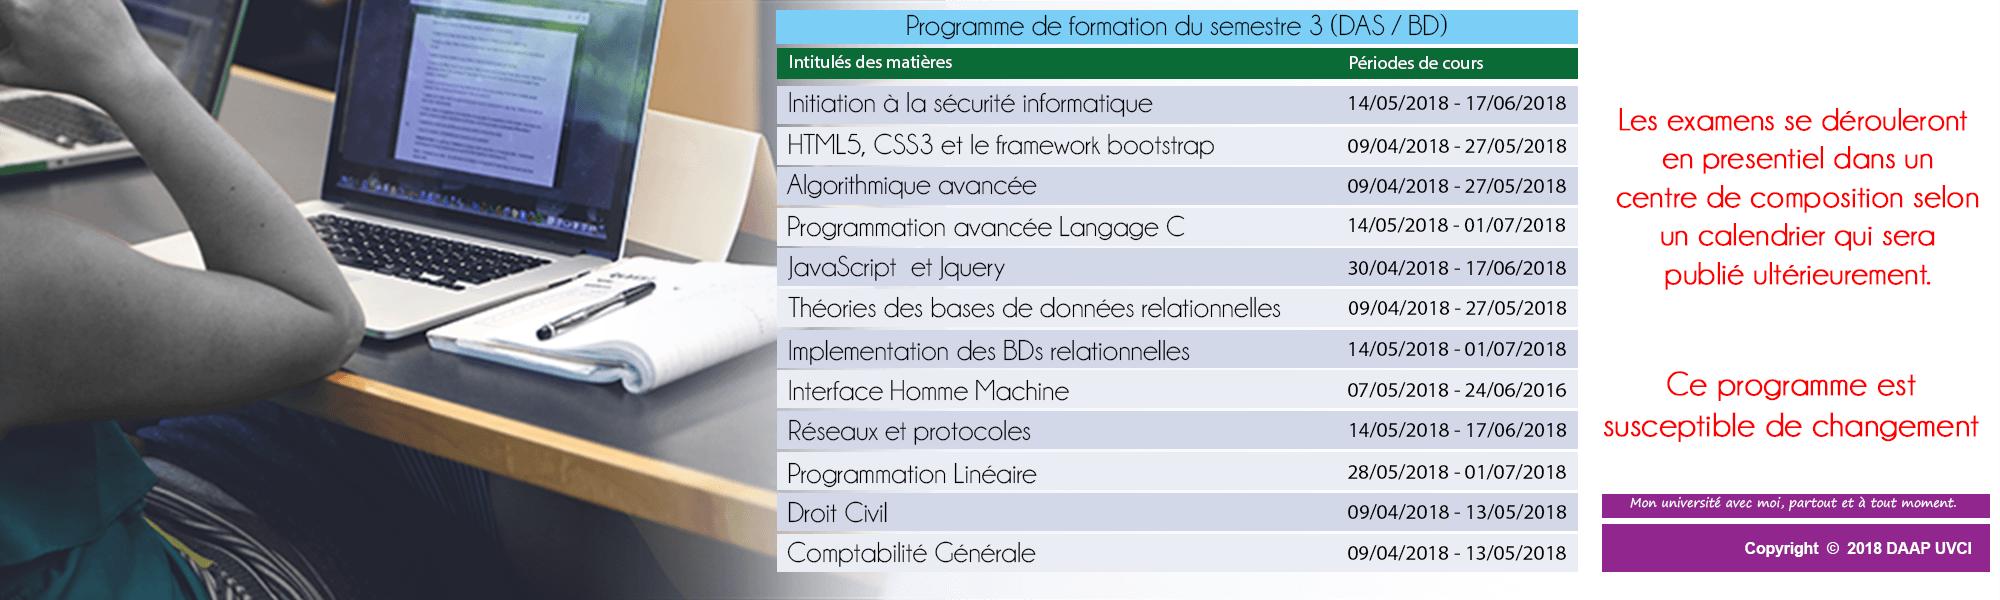 PROGRAMME DE FORMATION DU SEMESTRE 3 -BDA